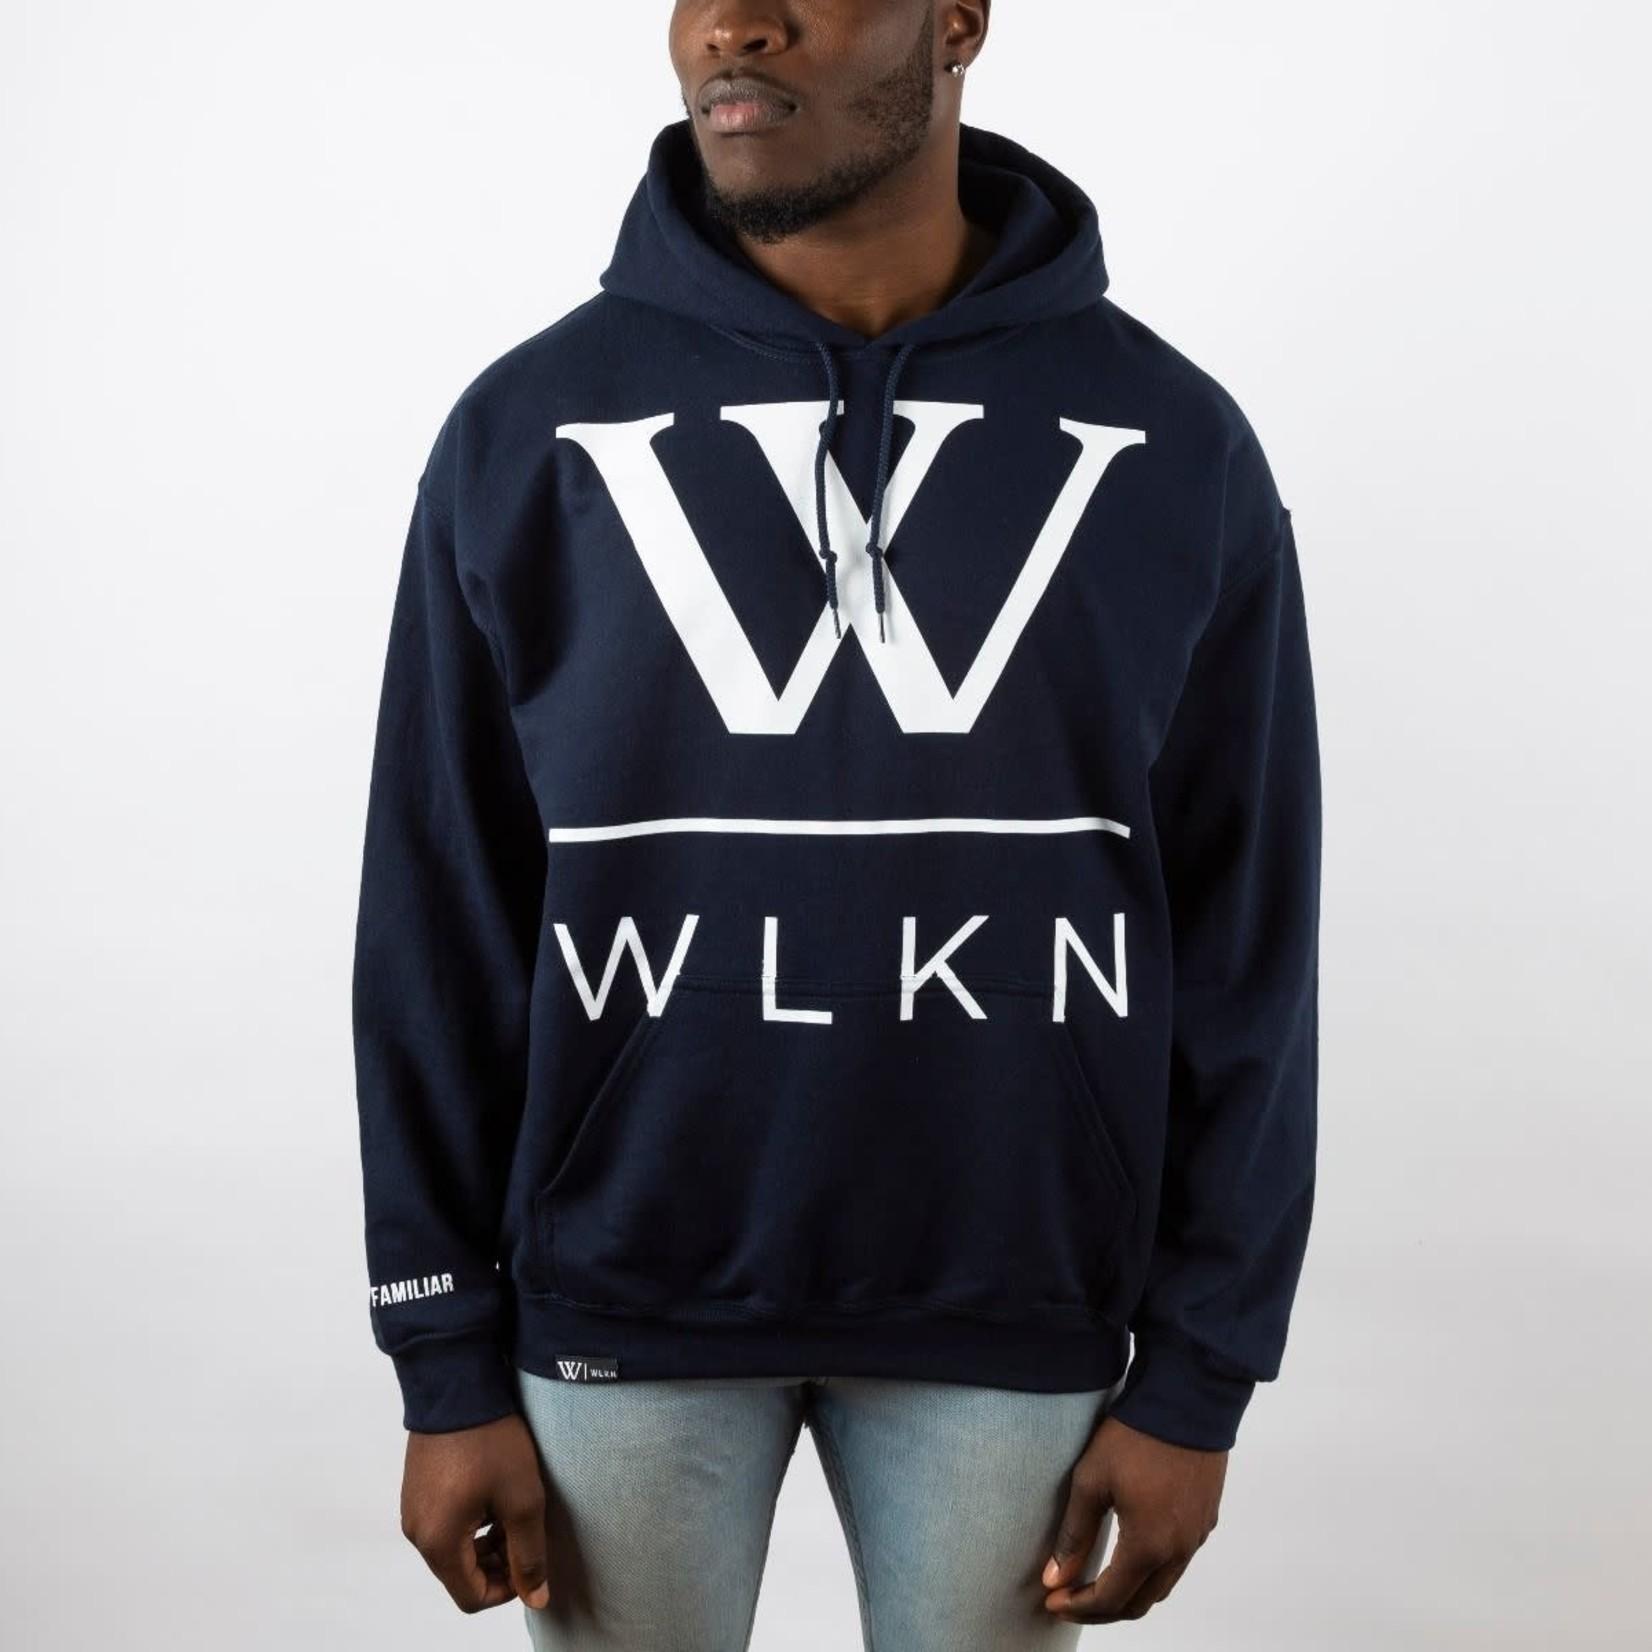 WLKN WLKN : The Men Basic WLKN Logo Pullover